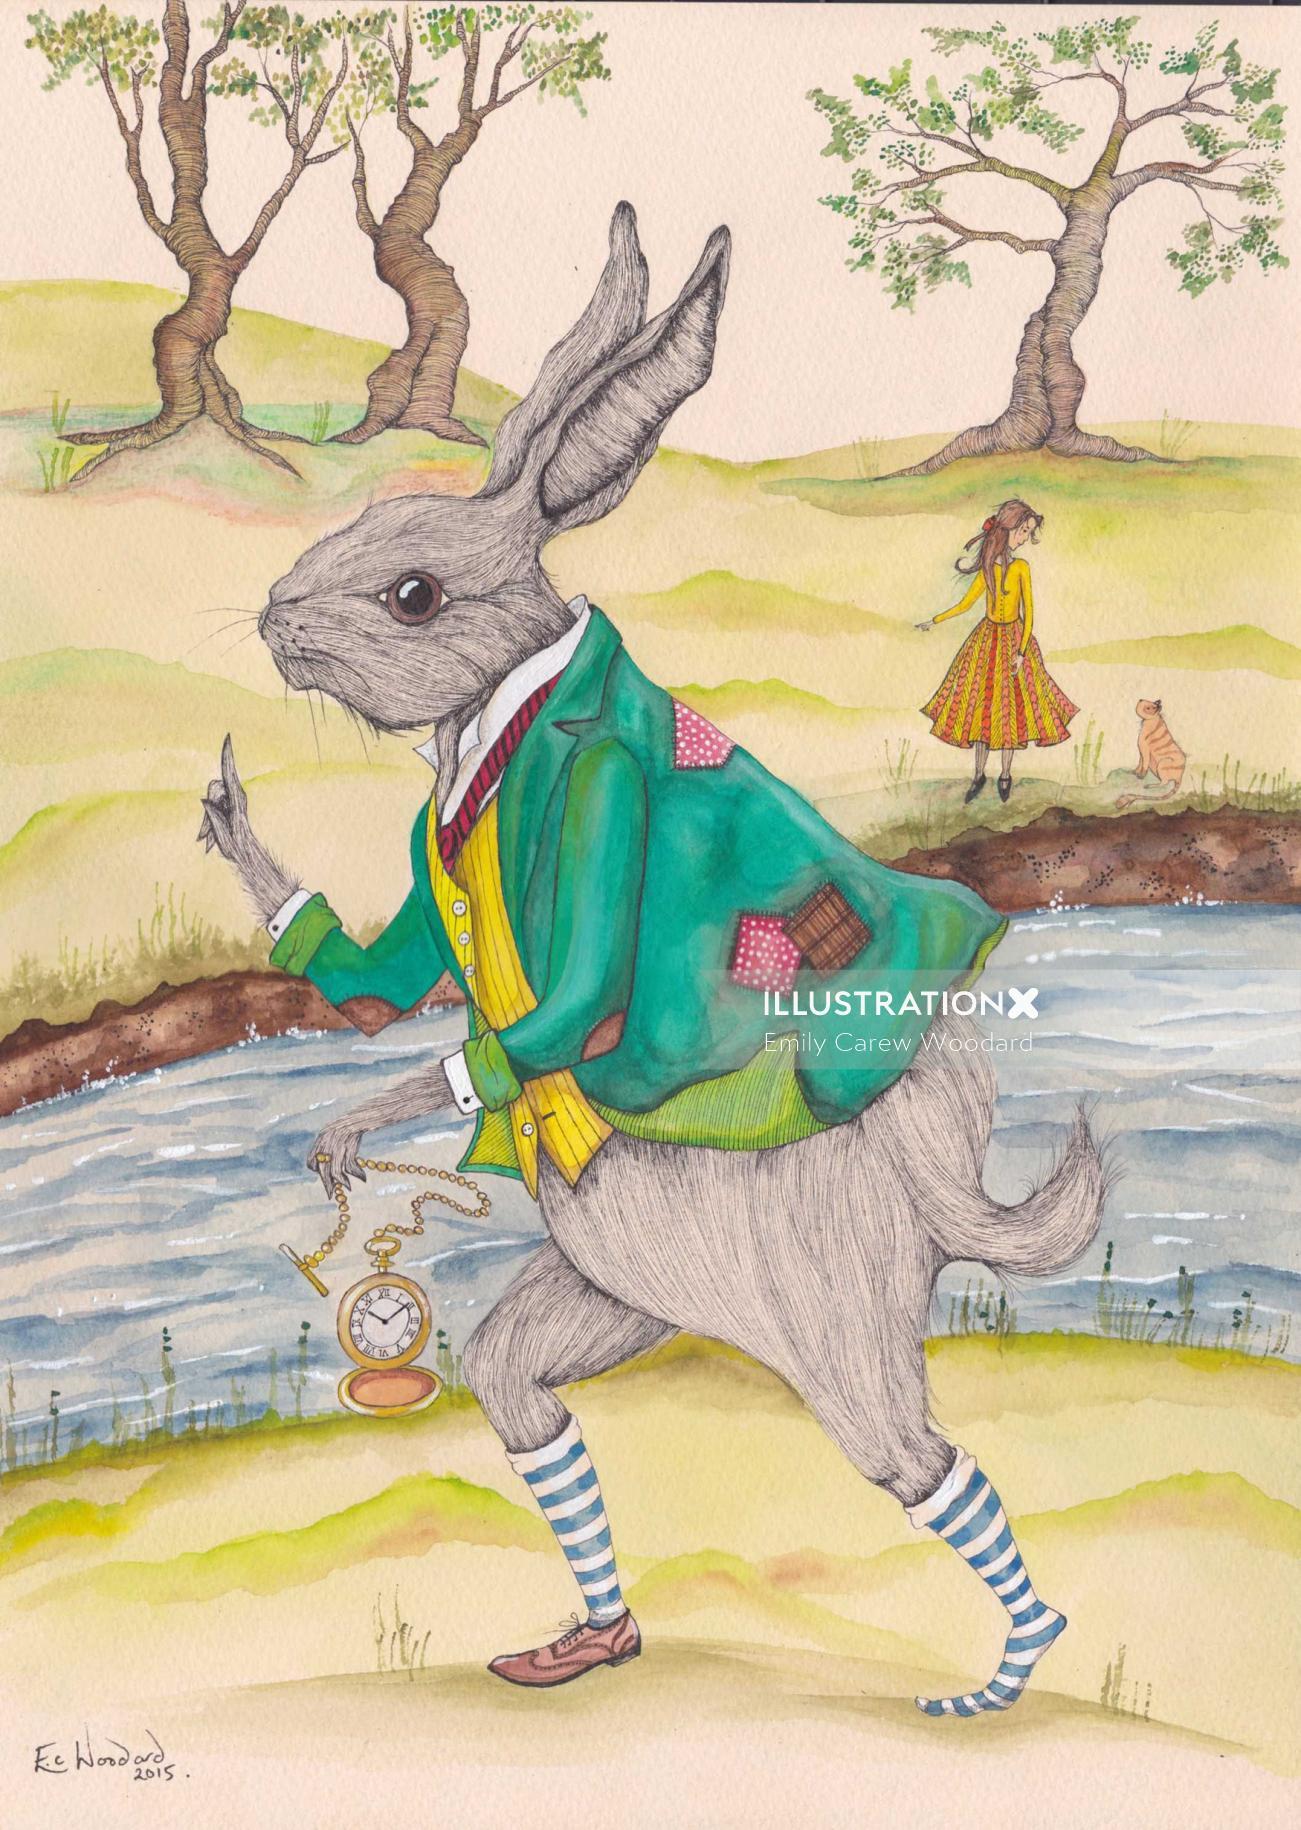 An illustration of rabbit in anthropomorphic scene